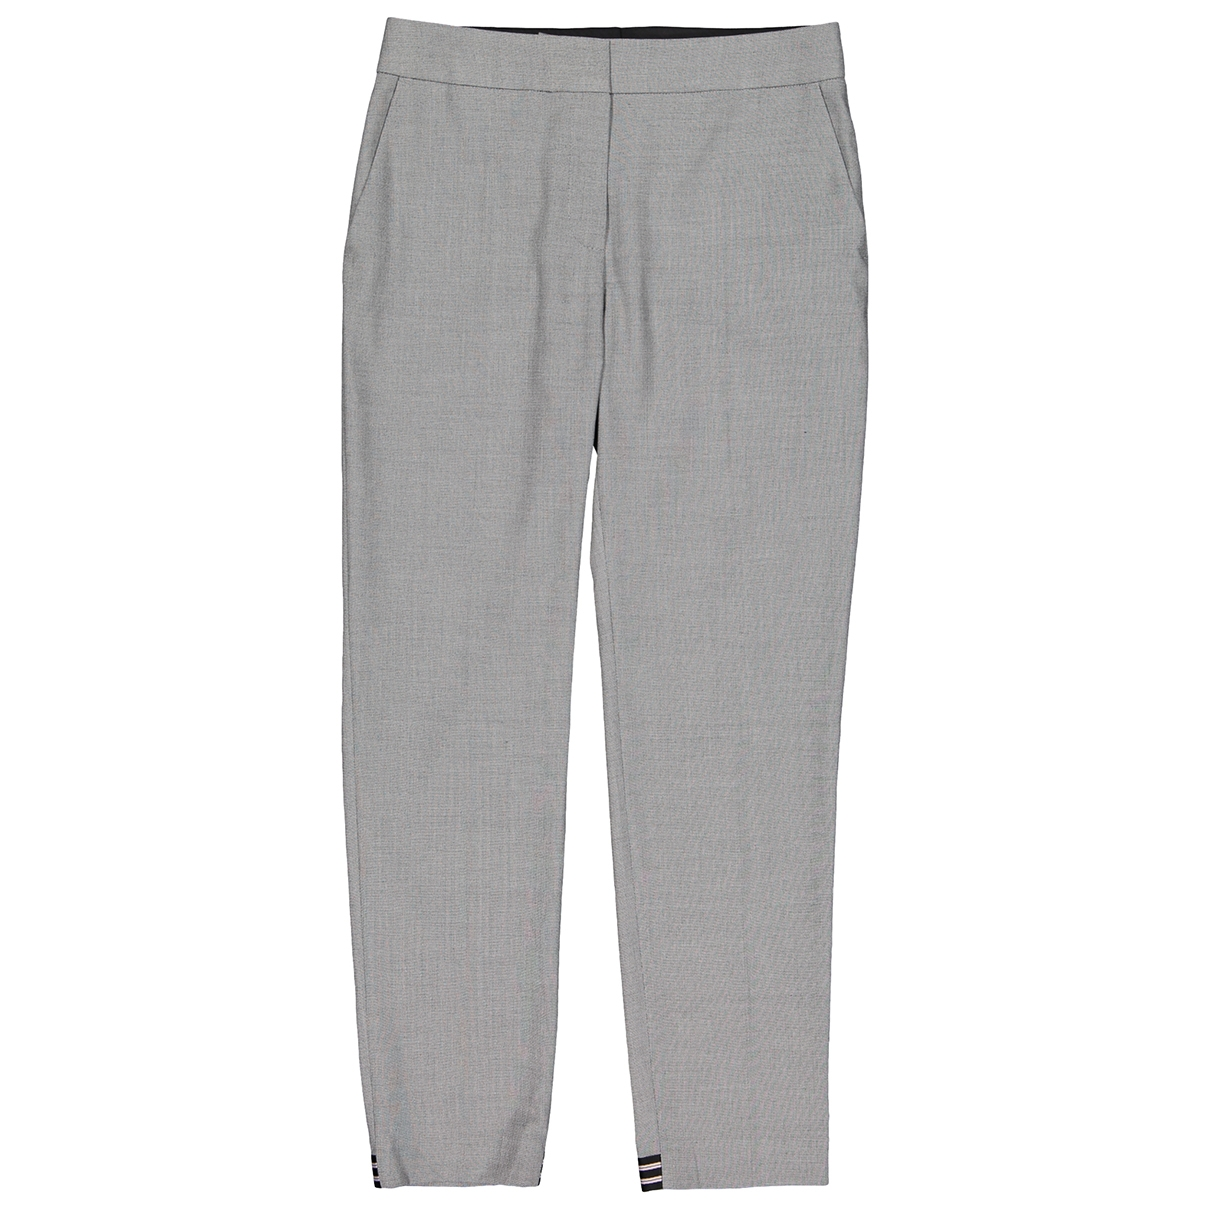 Claudie Pierlot \N Grey Trousers for Women 36 FR